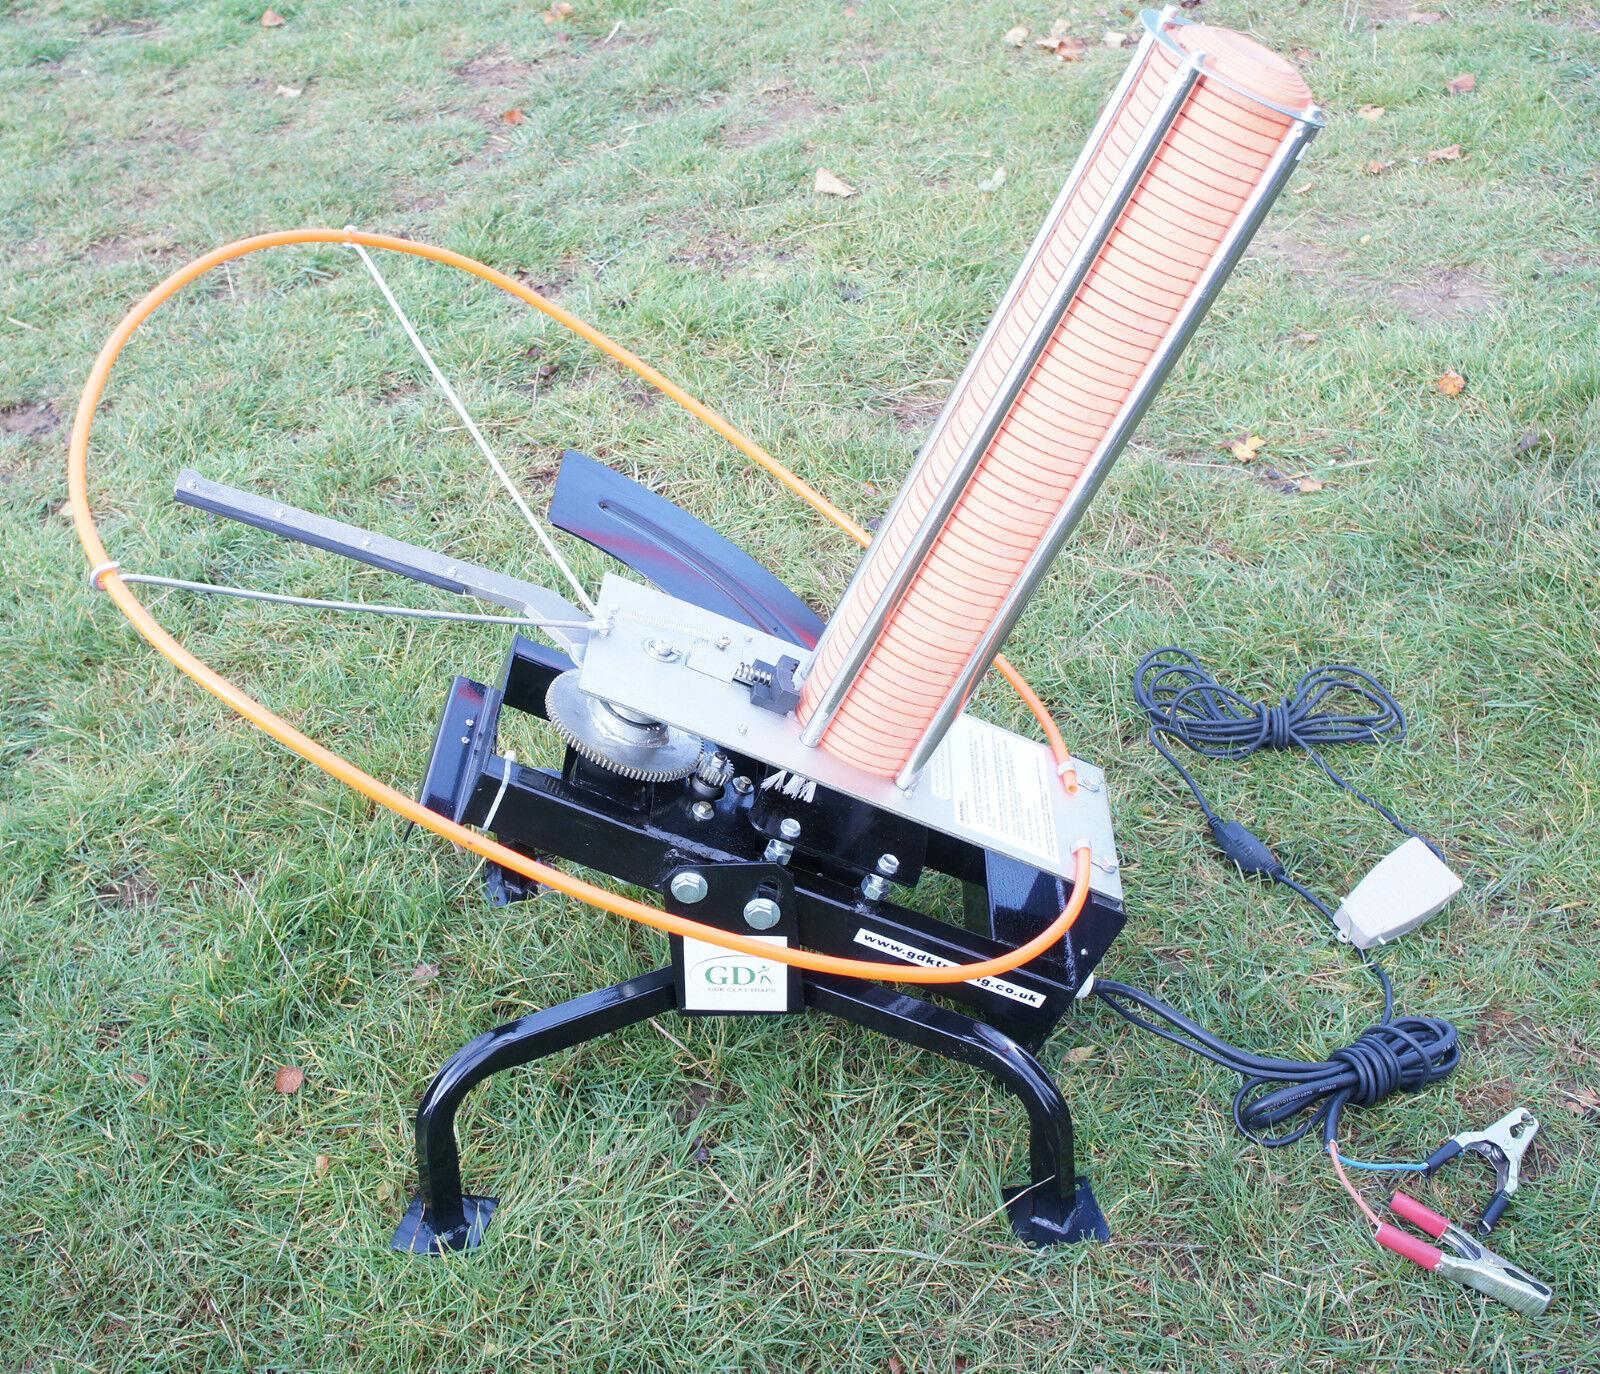 Gdk Black Quail Automatic 12v Electric Clay Pigeon Trap